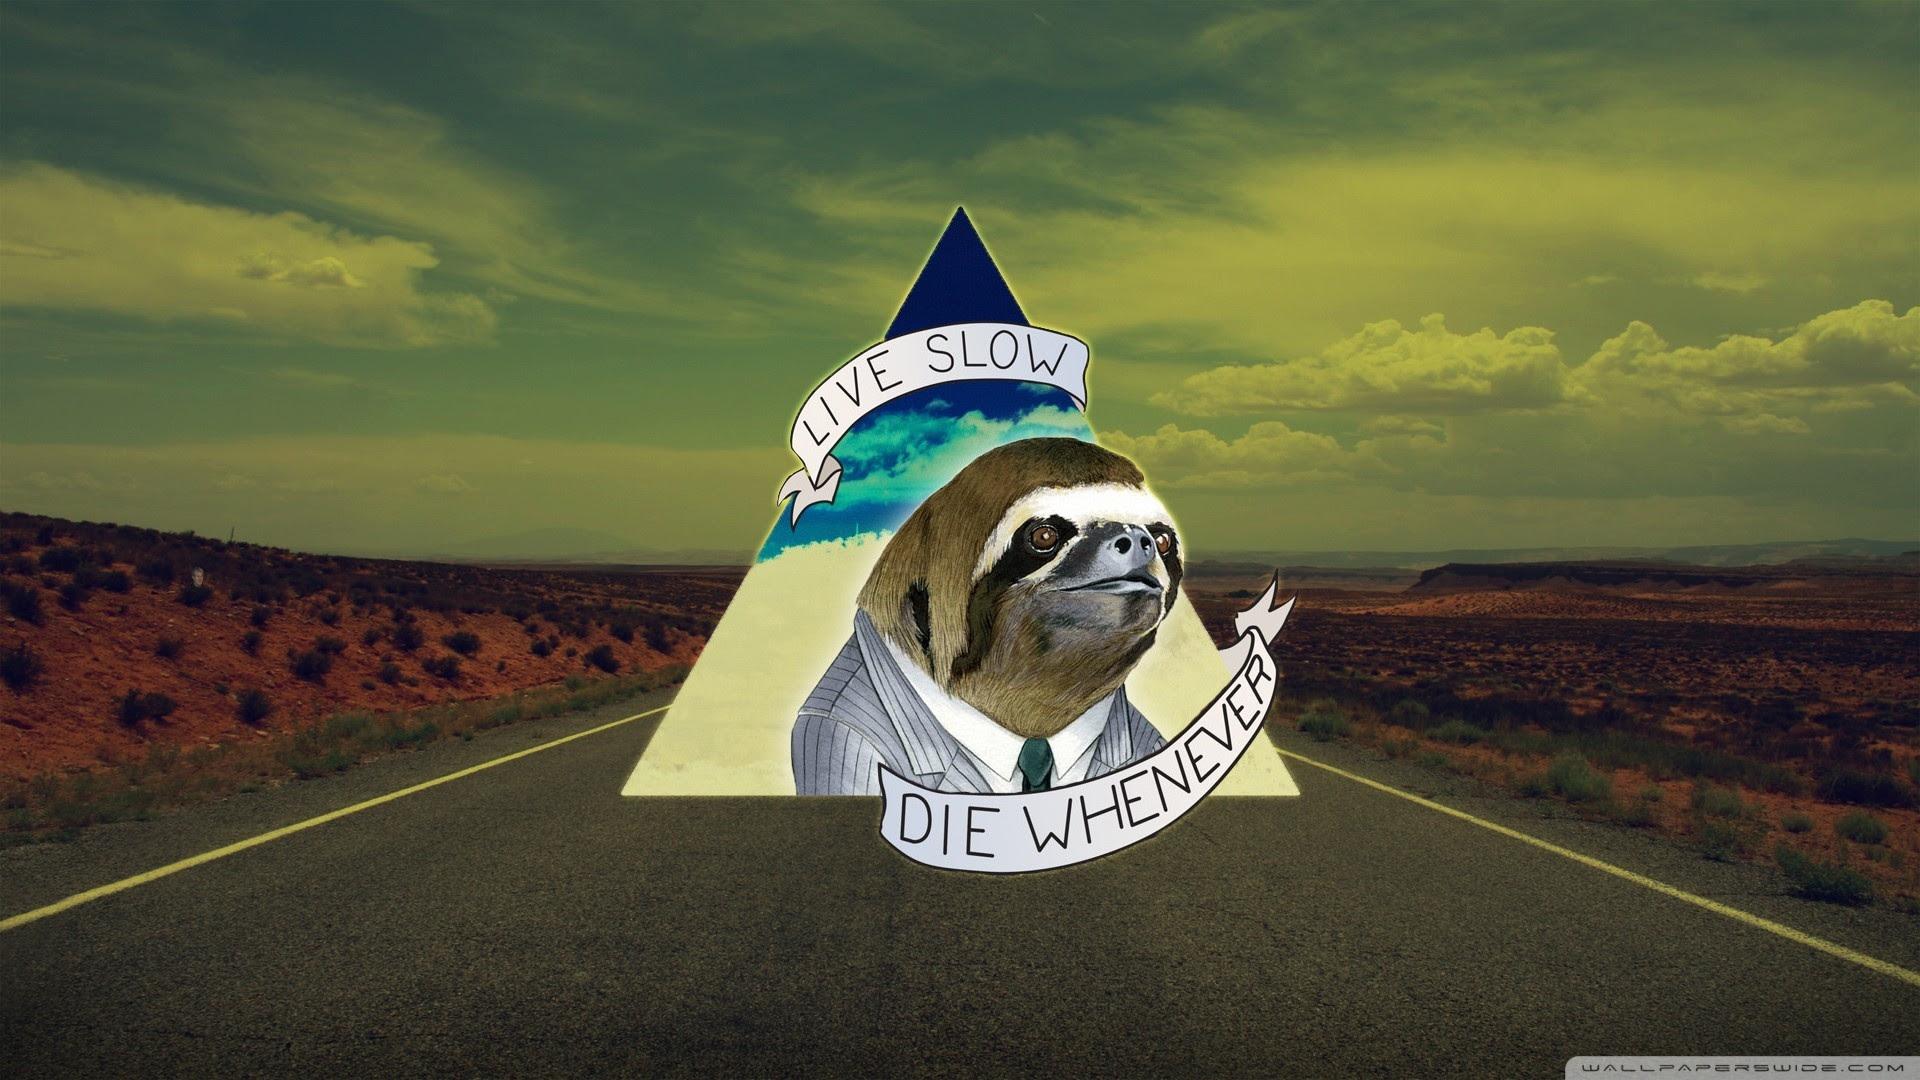 Live Slow Die Whenever Ultra Hd Desktop Background Wallpaper For